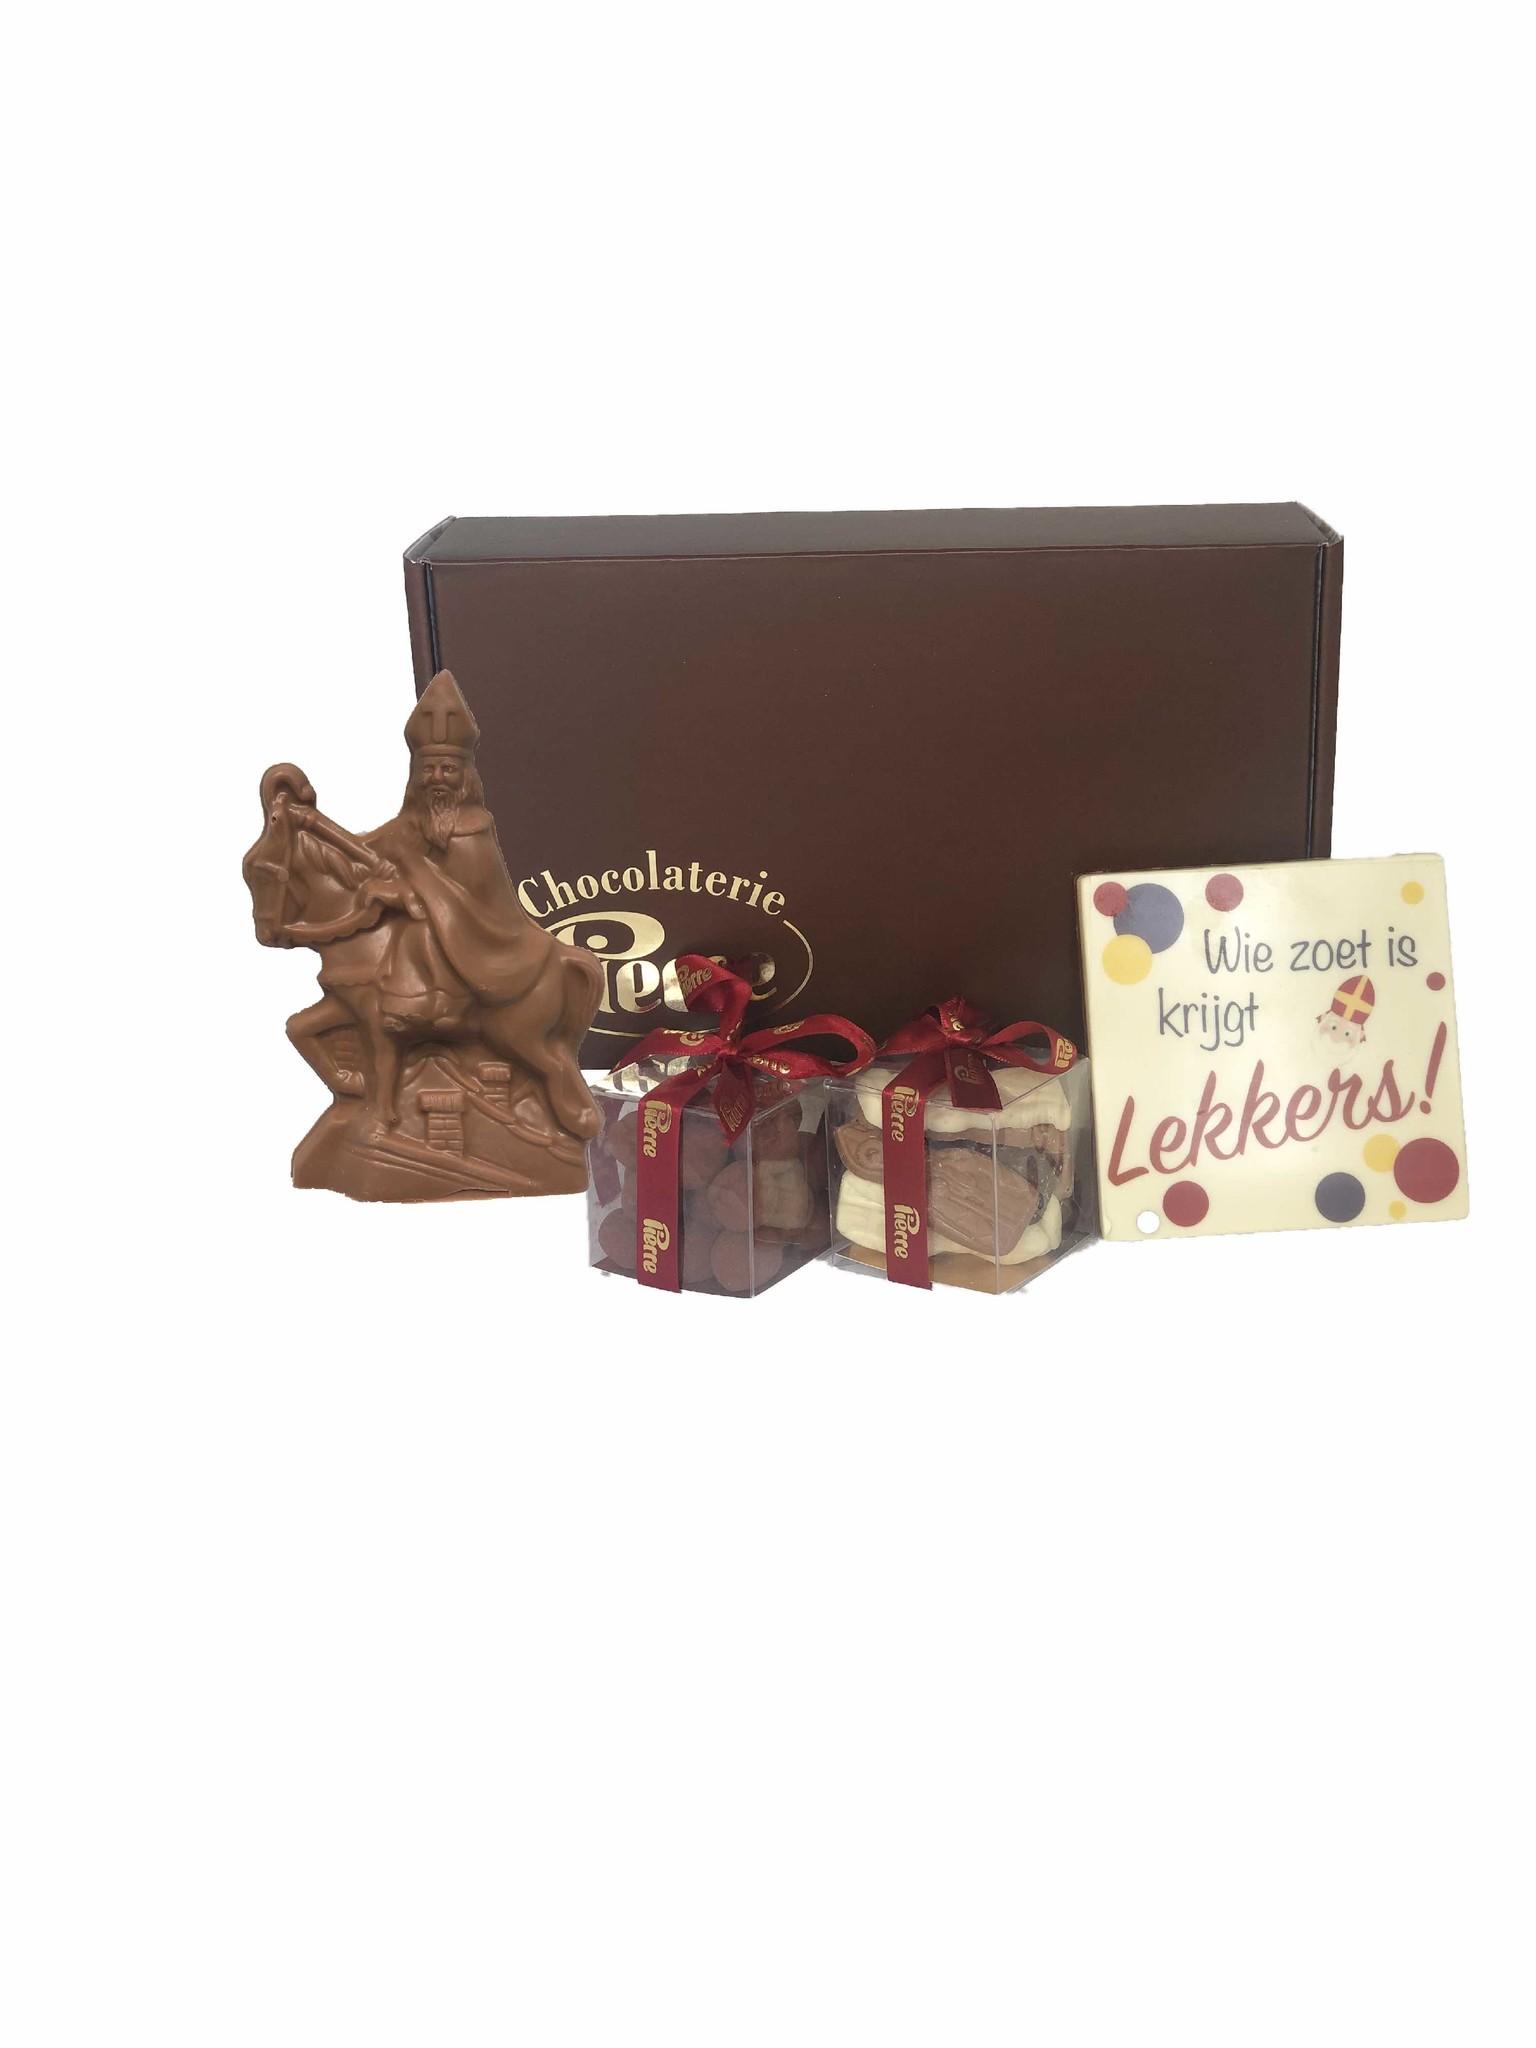 Sinterklaaspakket Delicious